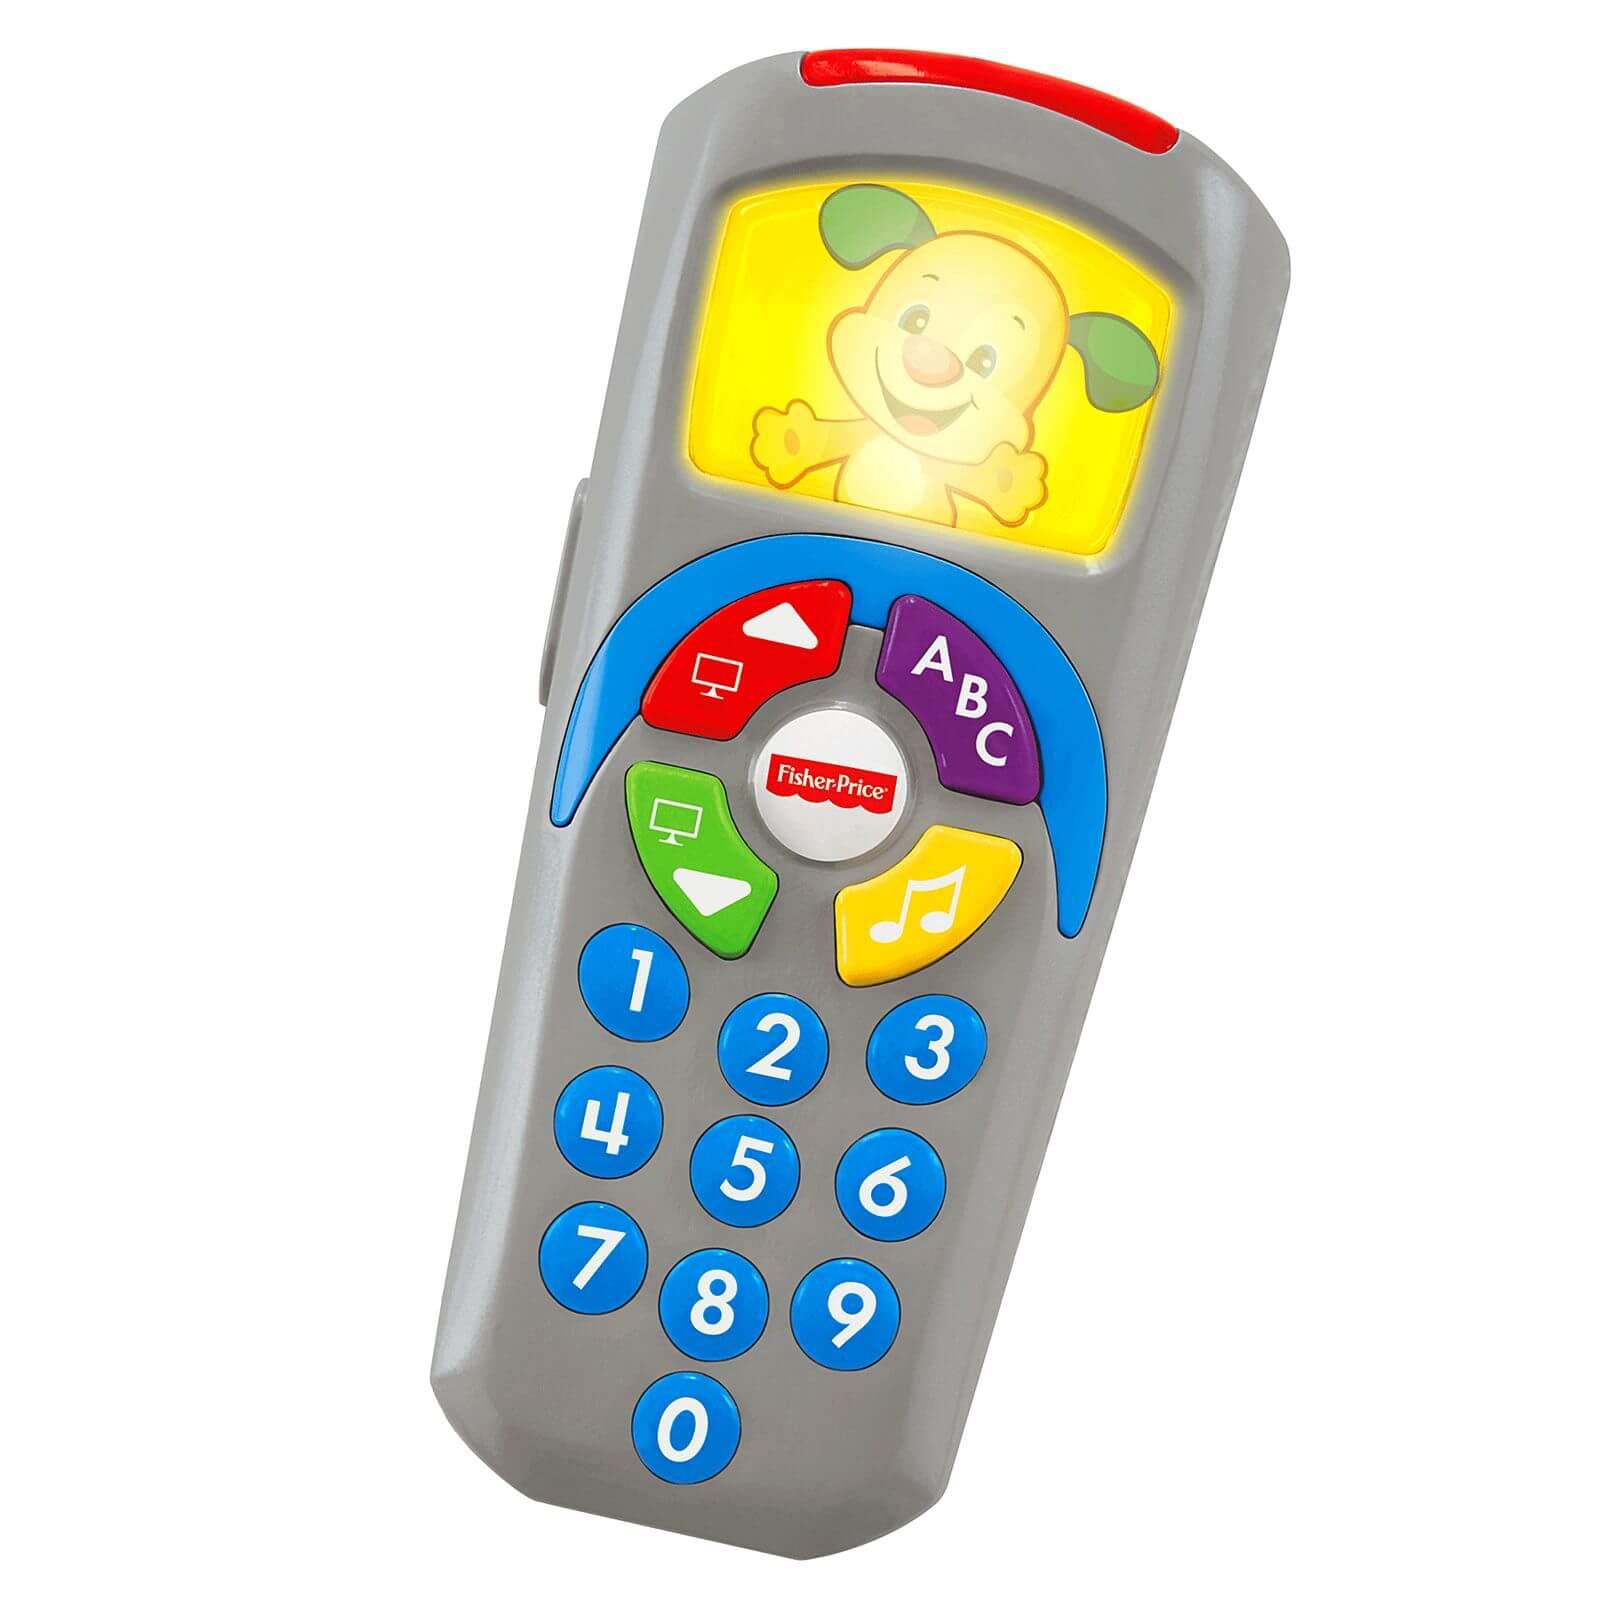 Fisher Price Controle Remoto Infantil Aprender E Brincar DLH40 Mattel